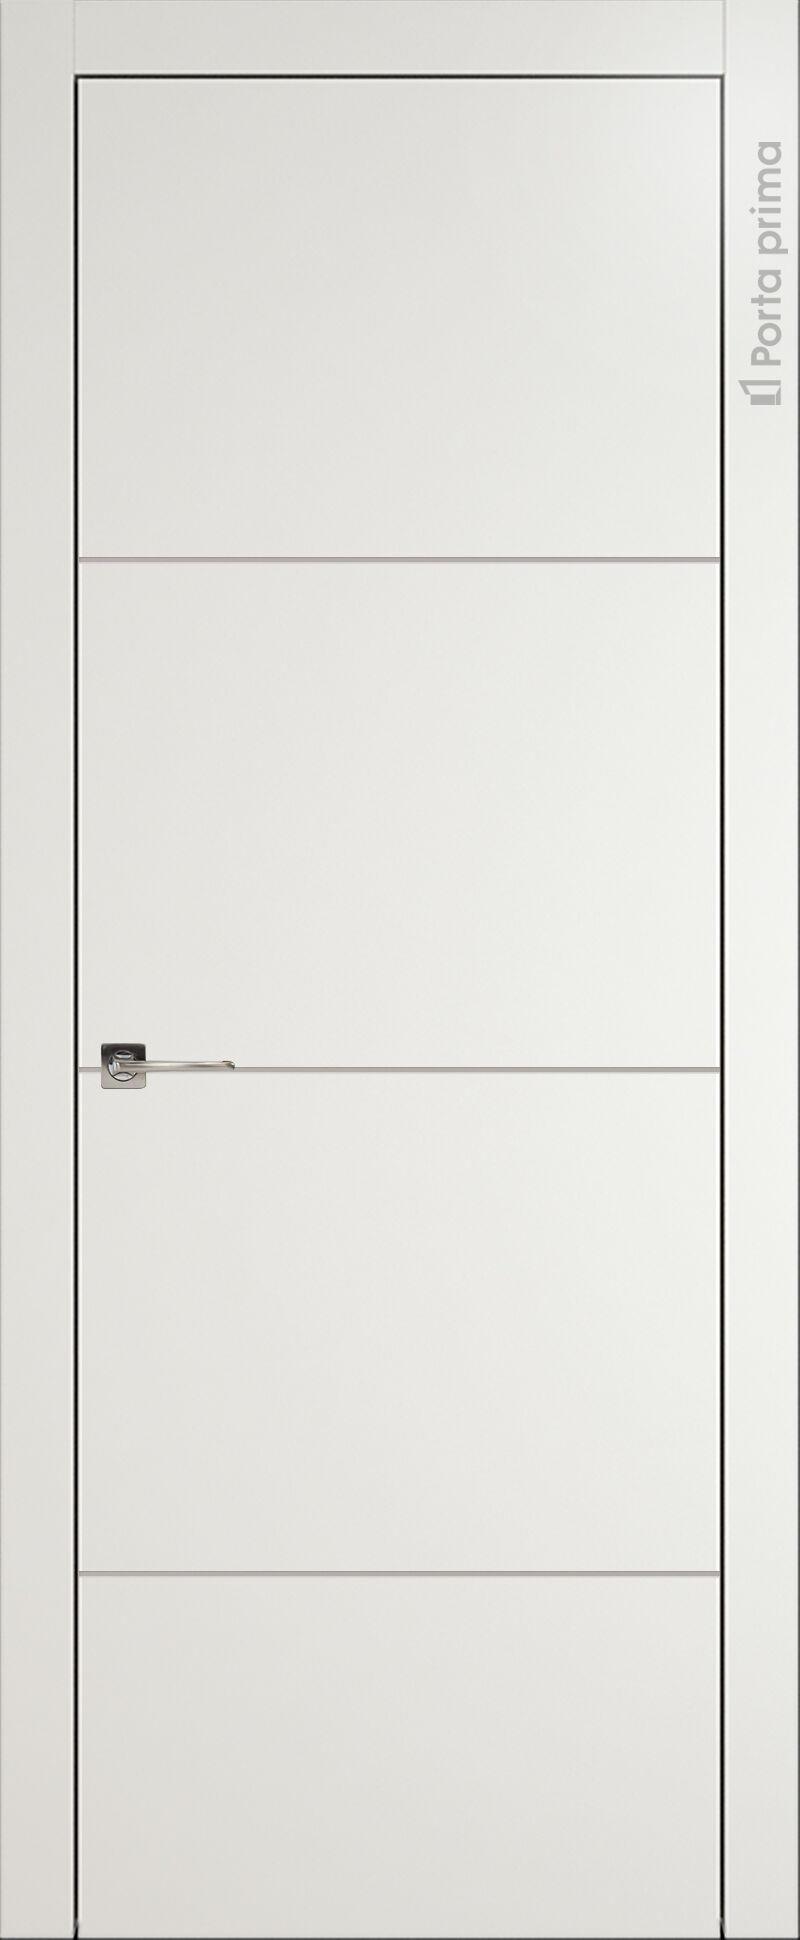 Tivoli Г-2 цвет - Бежевая эмаль (RAL 9010) Без стекла (ДГ)